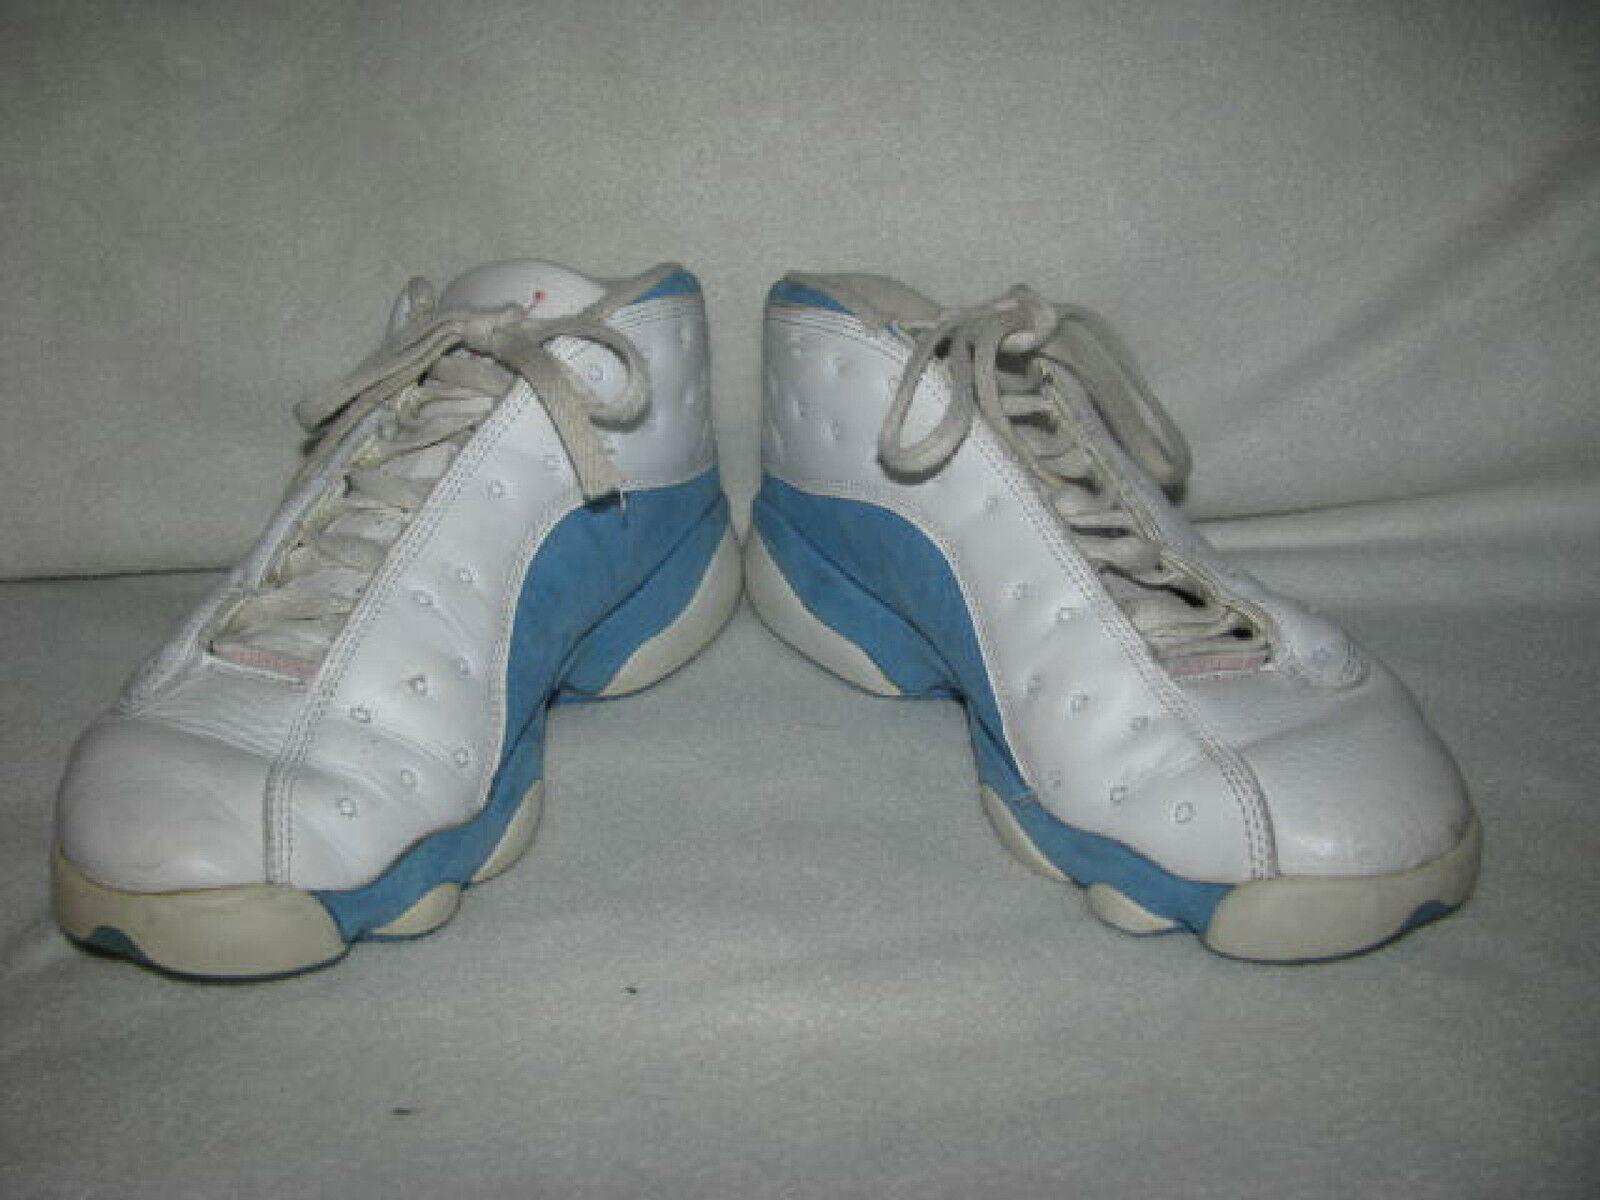 newest 718bb 62c5b ... ireland nike air jordan xiii low 13 bleu retro sz 8.5 blanc bleu 13  sneakers 310804 ...